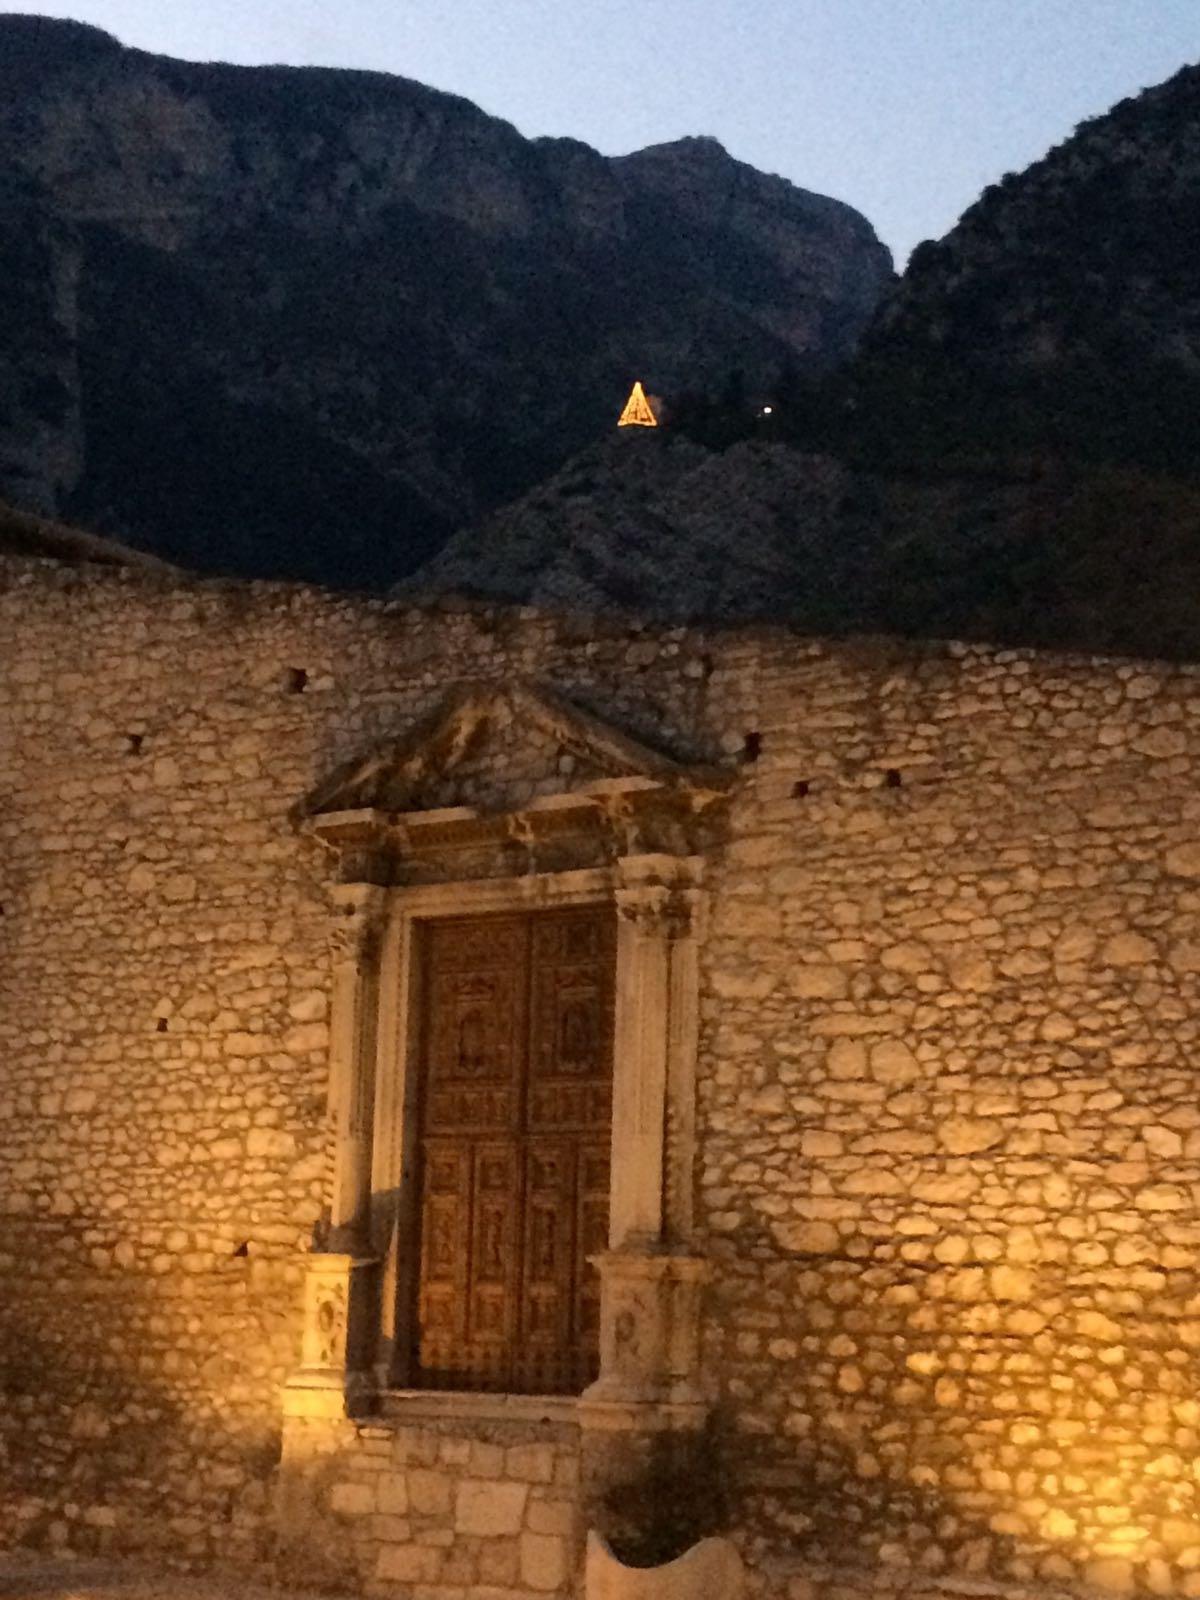 San Biagio Notte